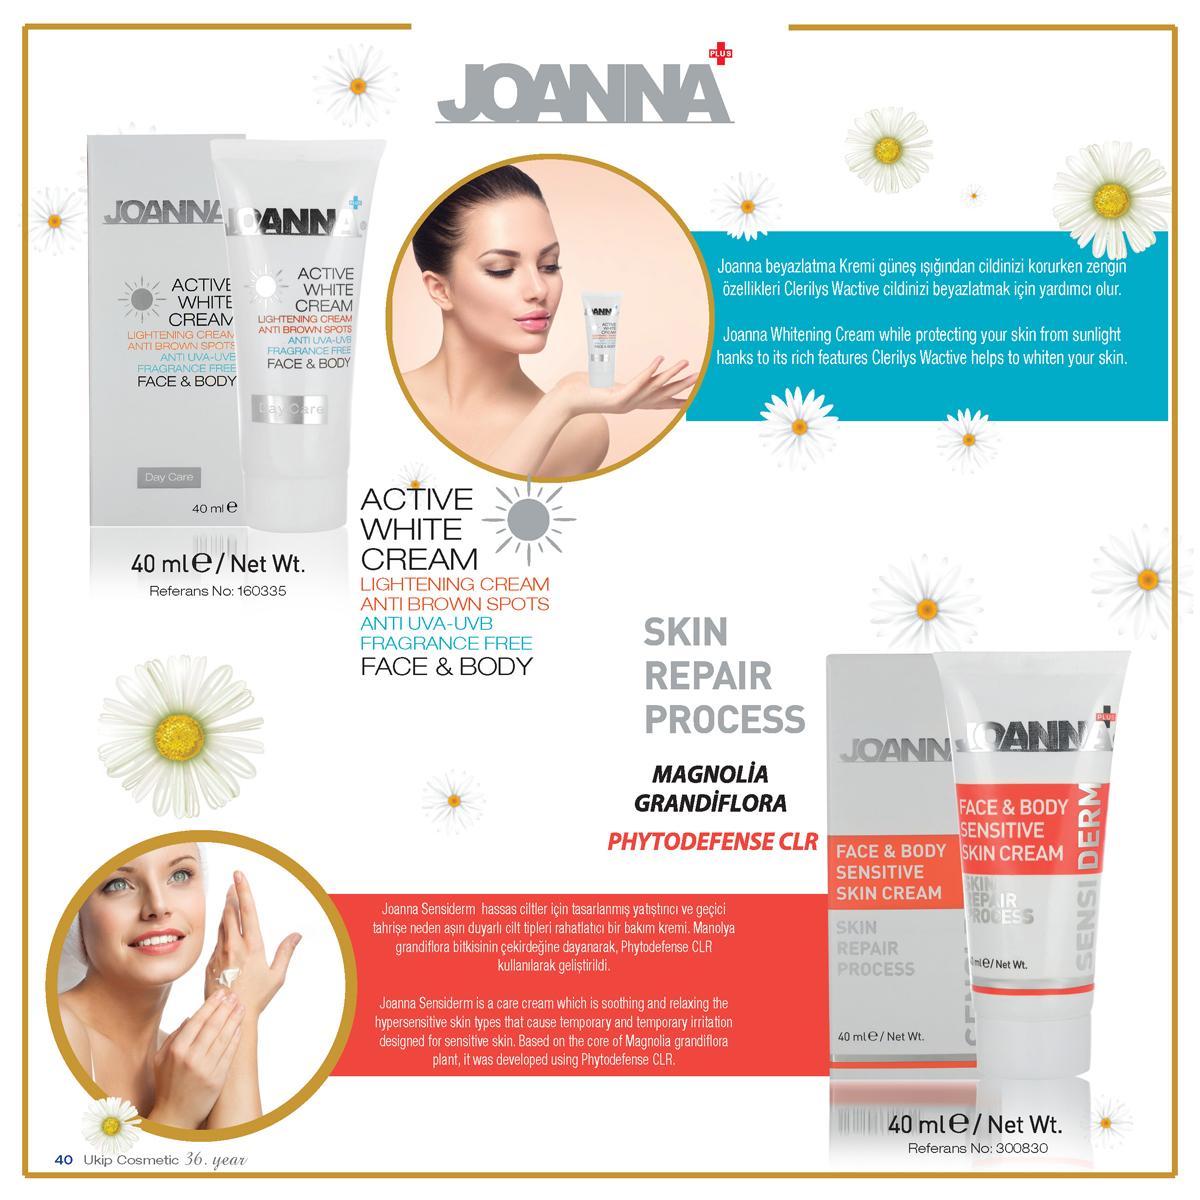 Joanna active white cream